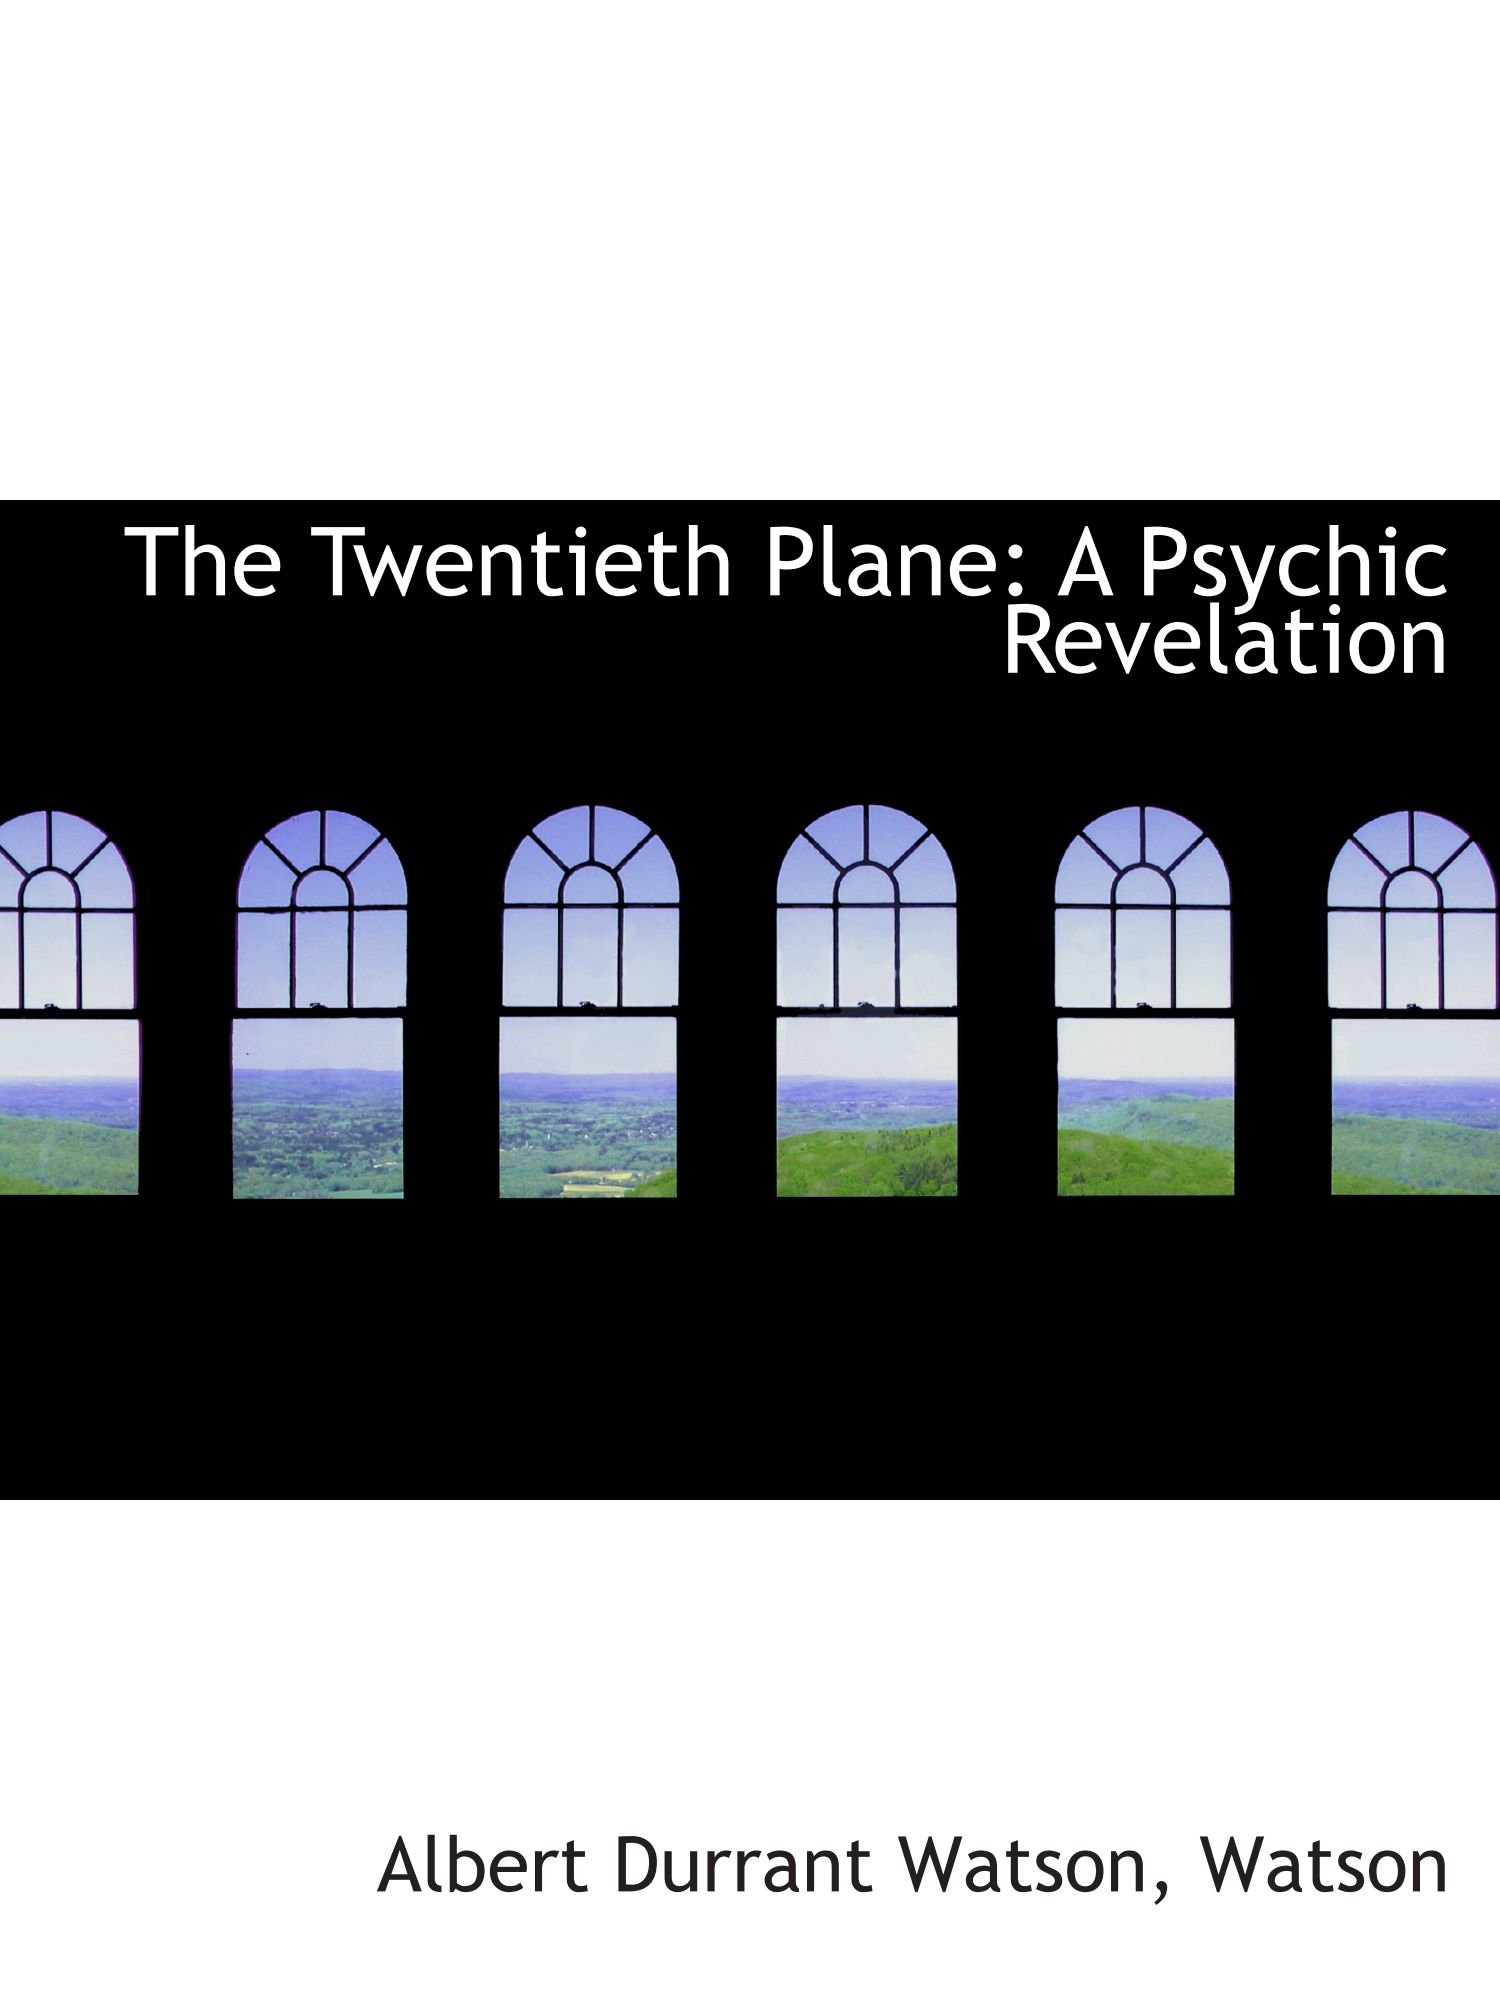 The Twentieth Plane: A Psychic Revelation ebook